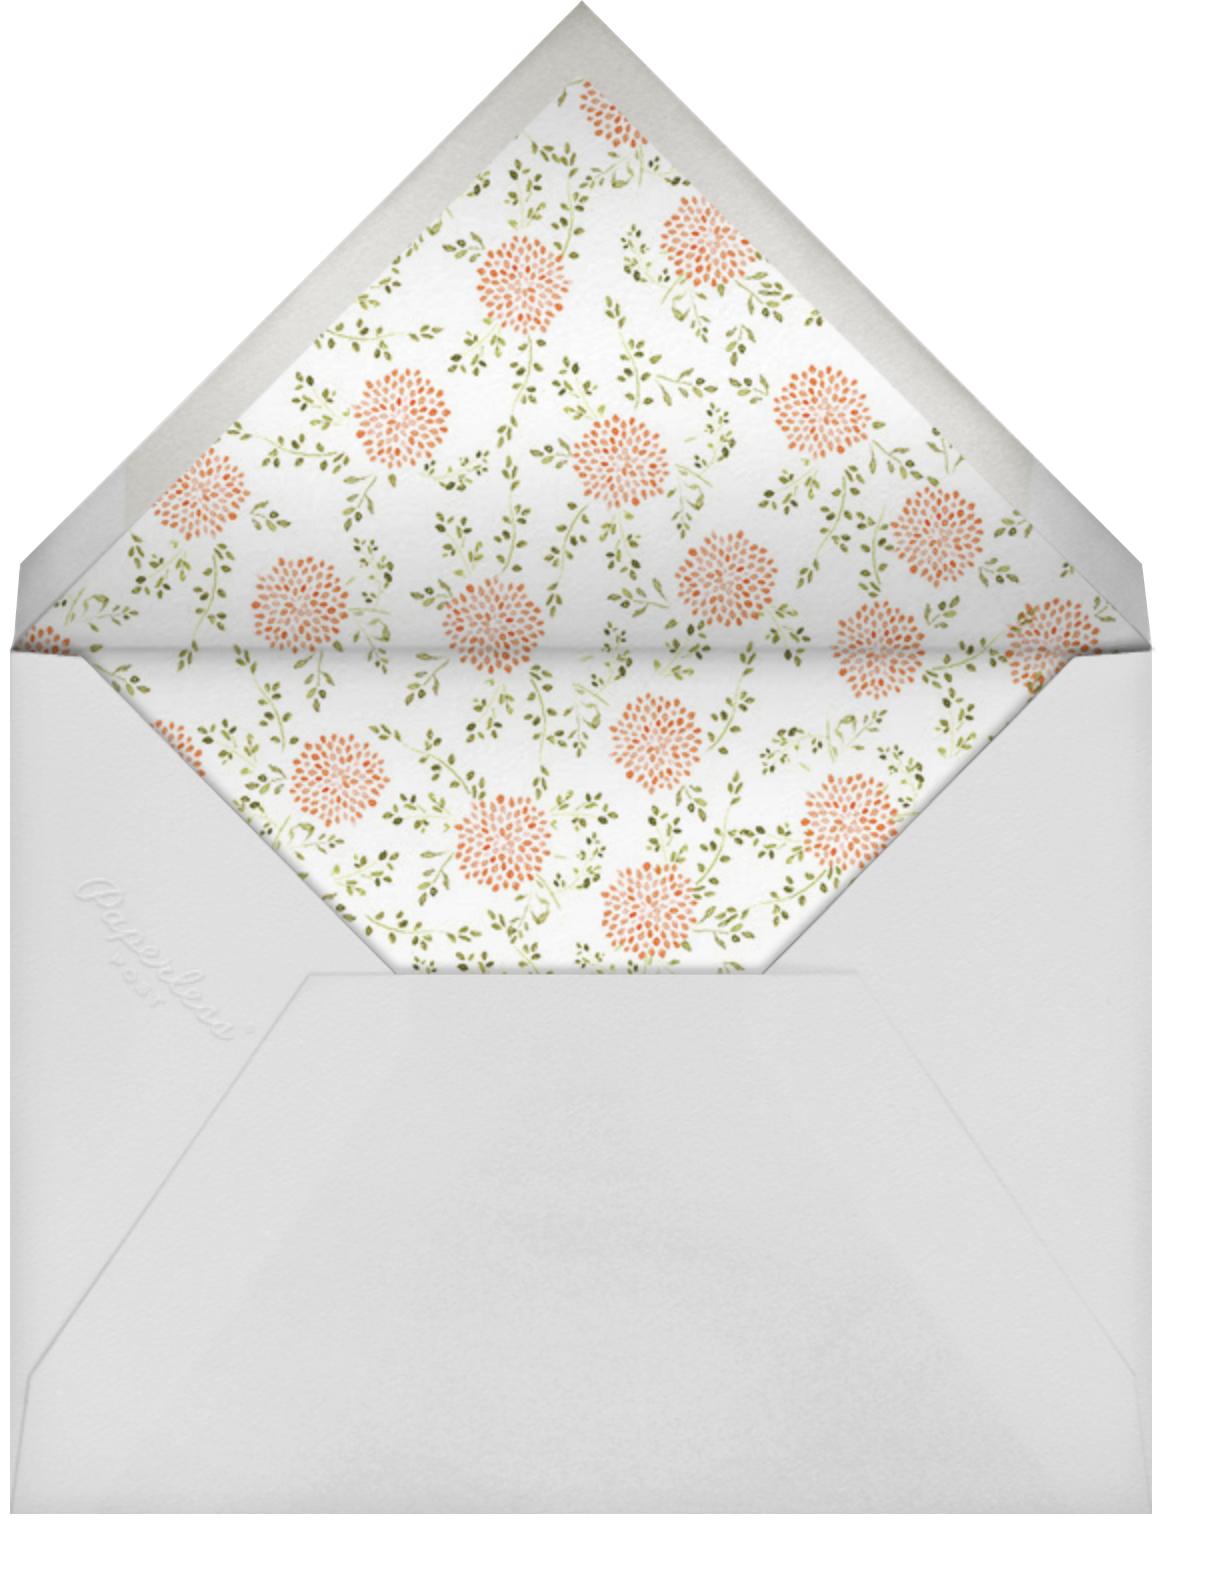 Dahlias (Tall) - Pumpkin - Paperless Post - Engagement party - envelope back